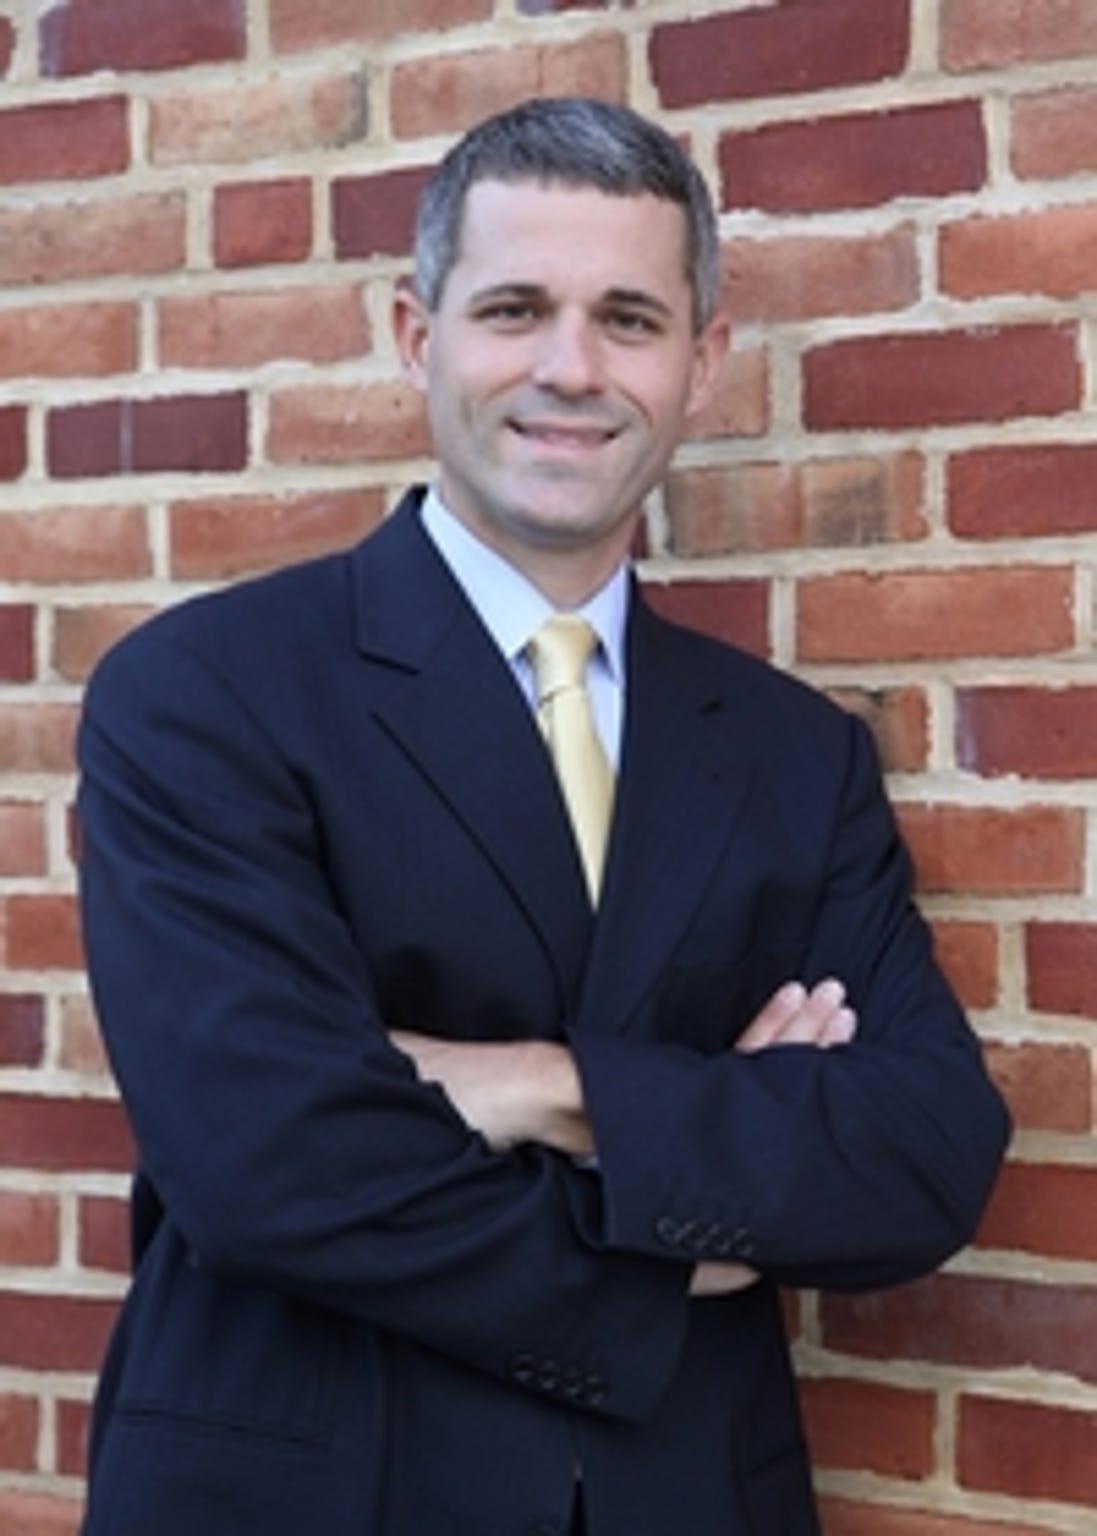 State Rep. Rob W. Kauffman